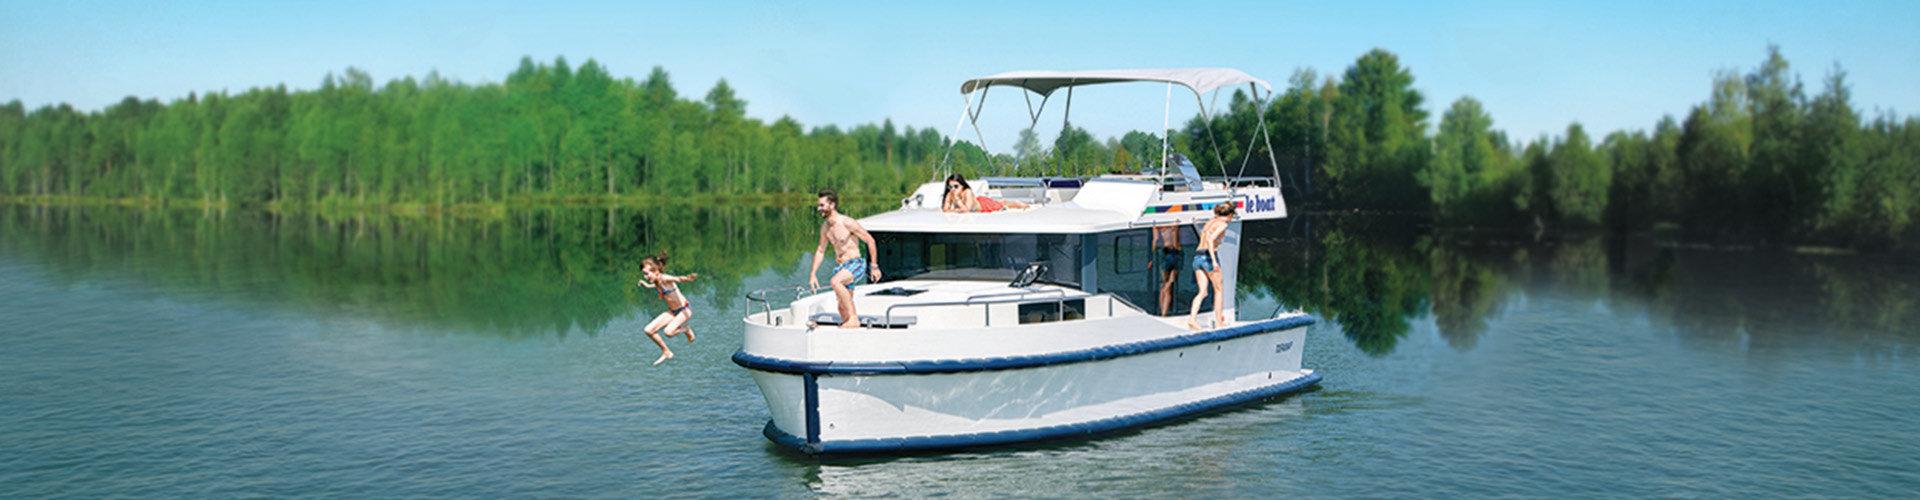 Le Boat - No.1 Provider of Boating Holidays